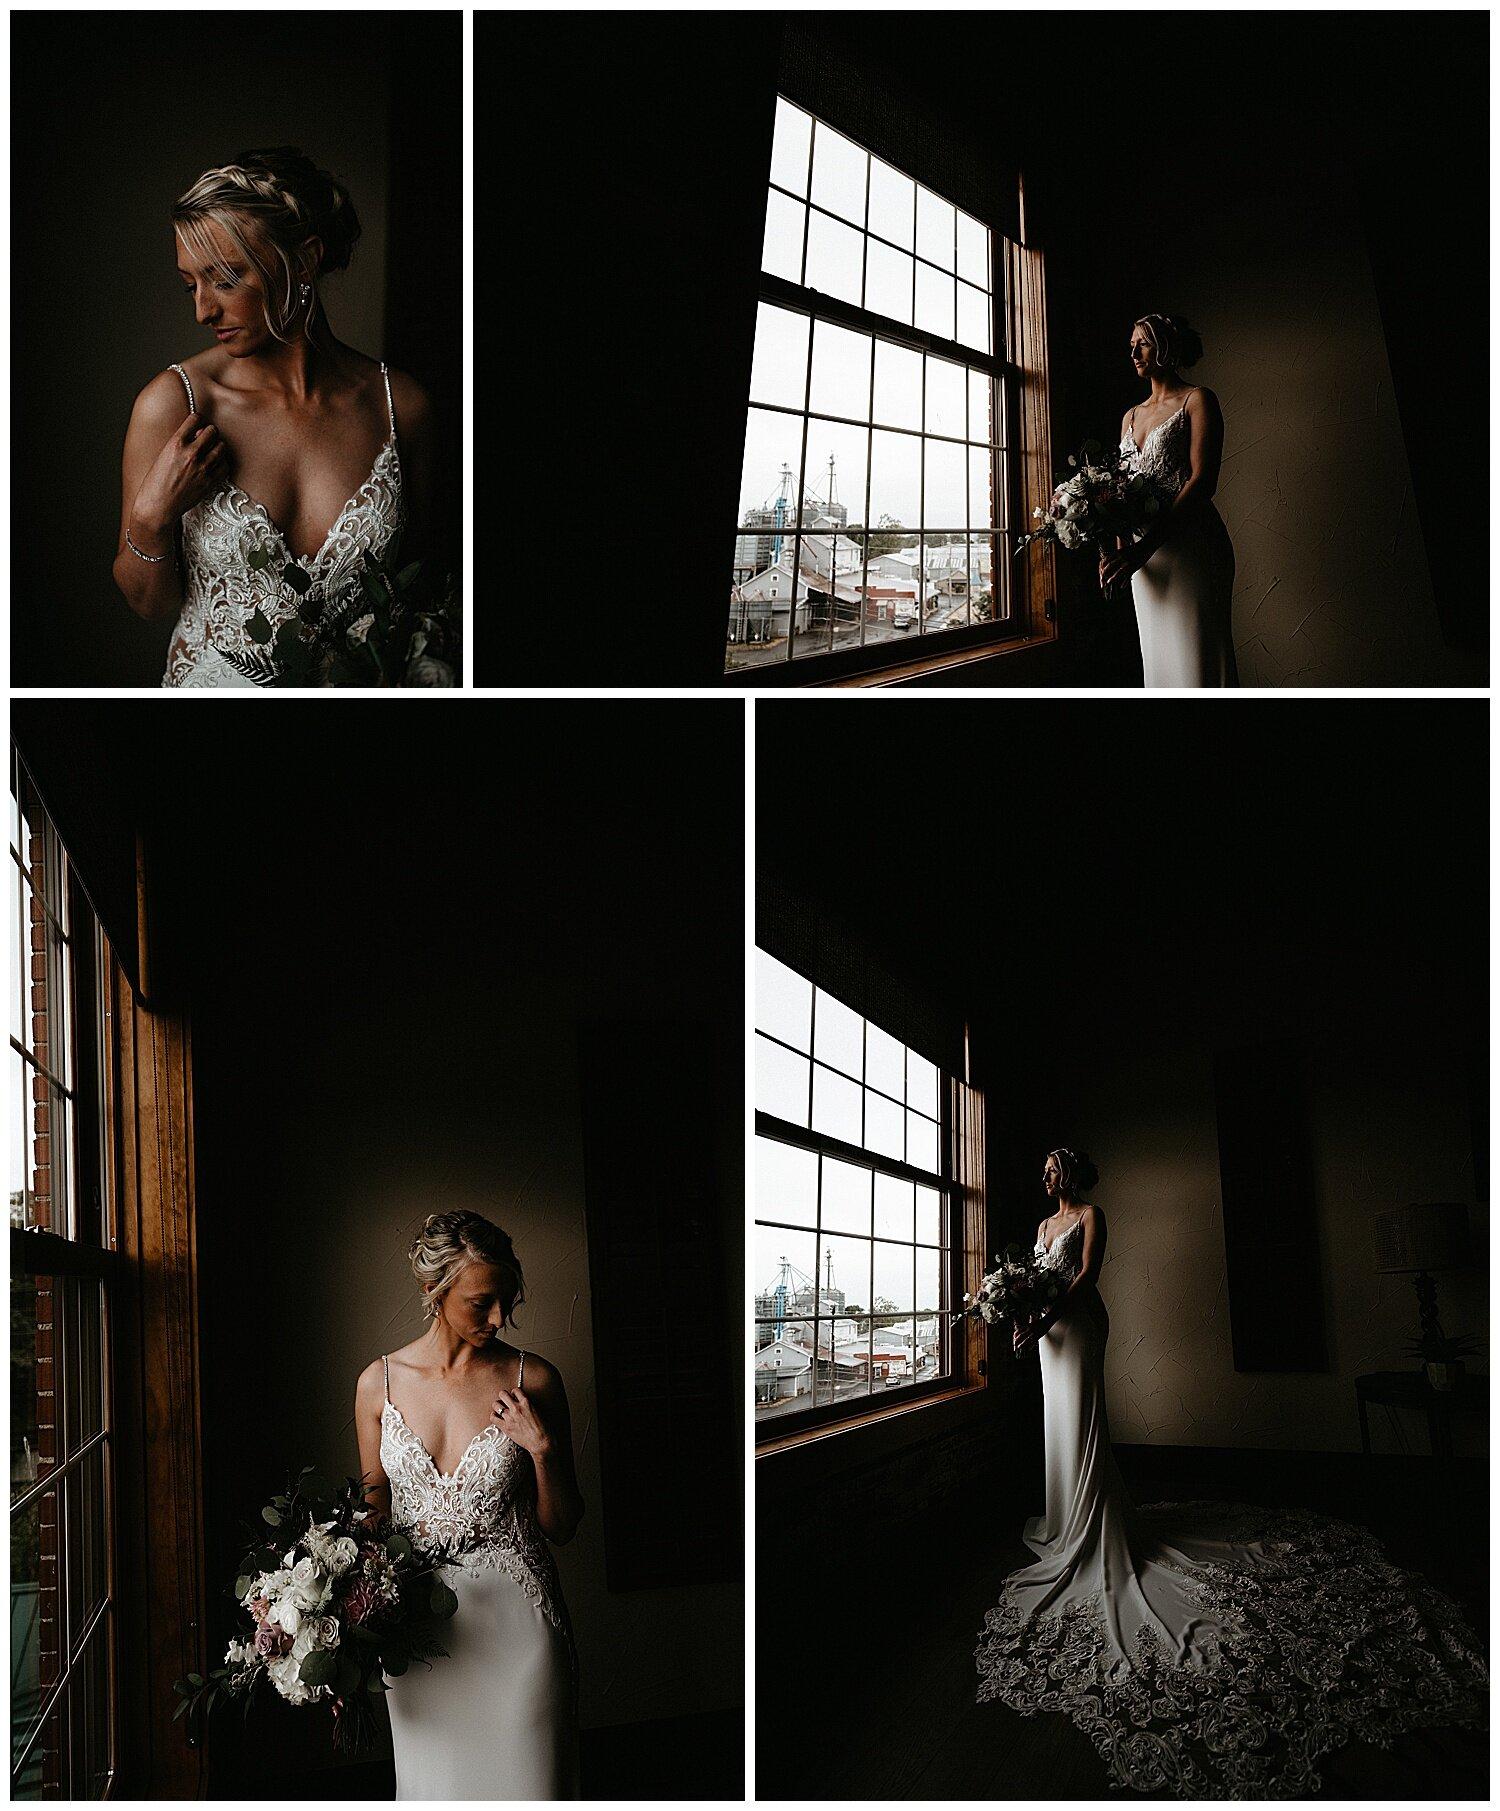 NEPA-Lewisburg-Wedding-Photographer-at-the-Rusty-Rail_0017.jpg